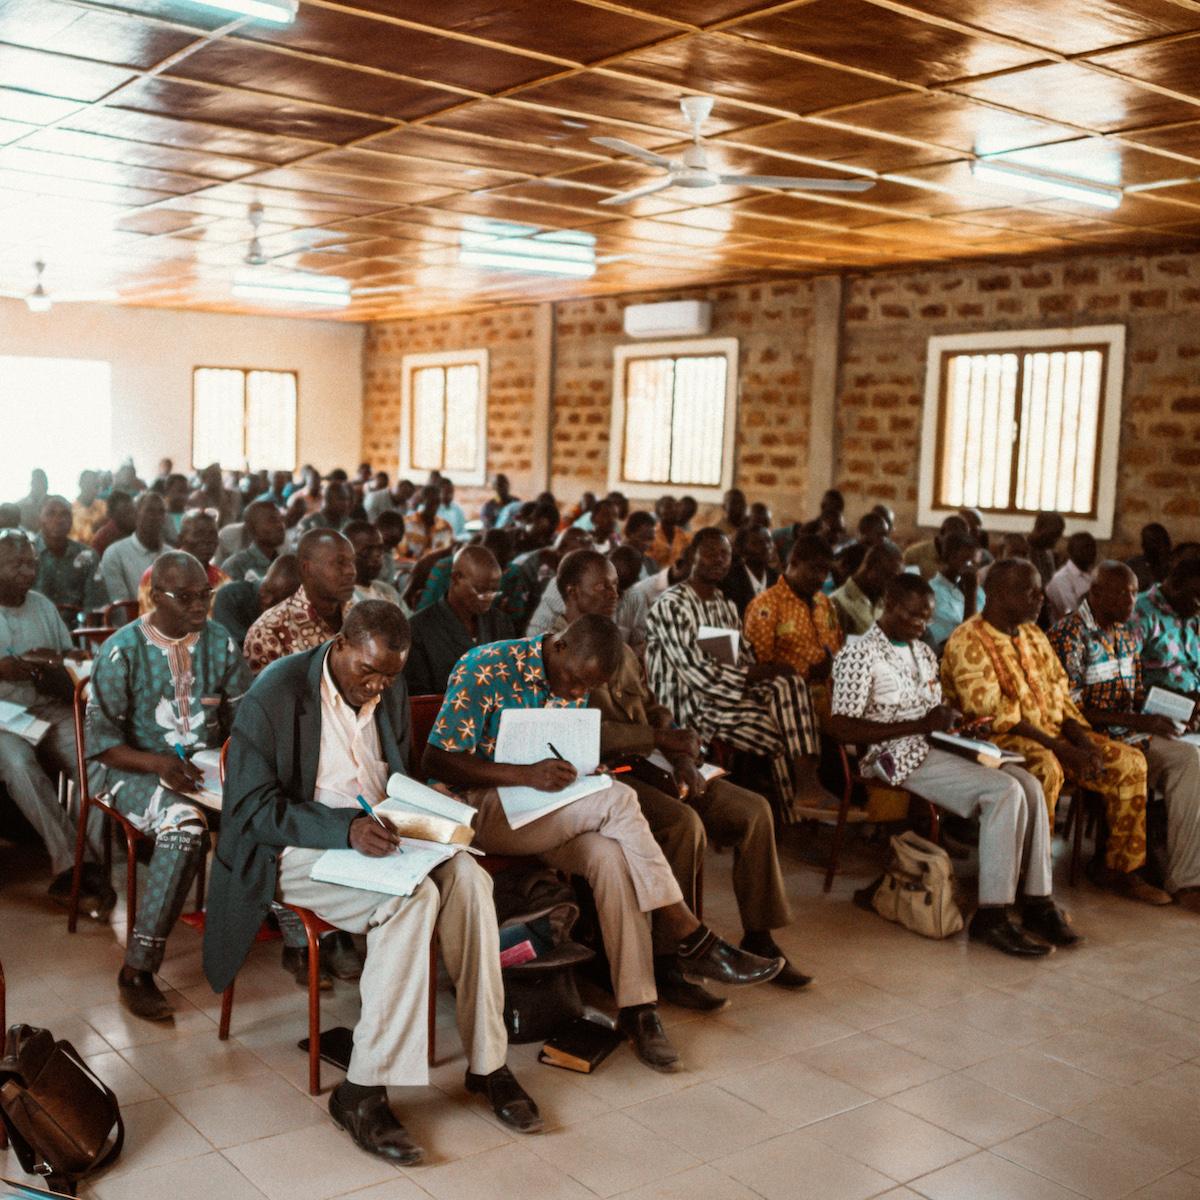 The Advancing Church in Burkina Faso